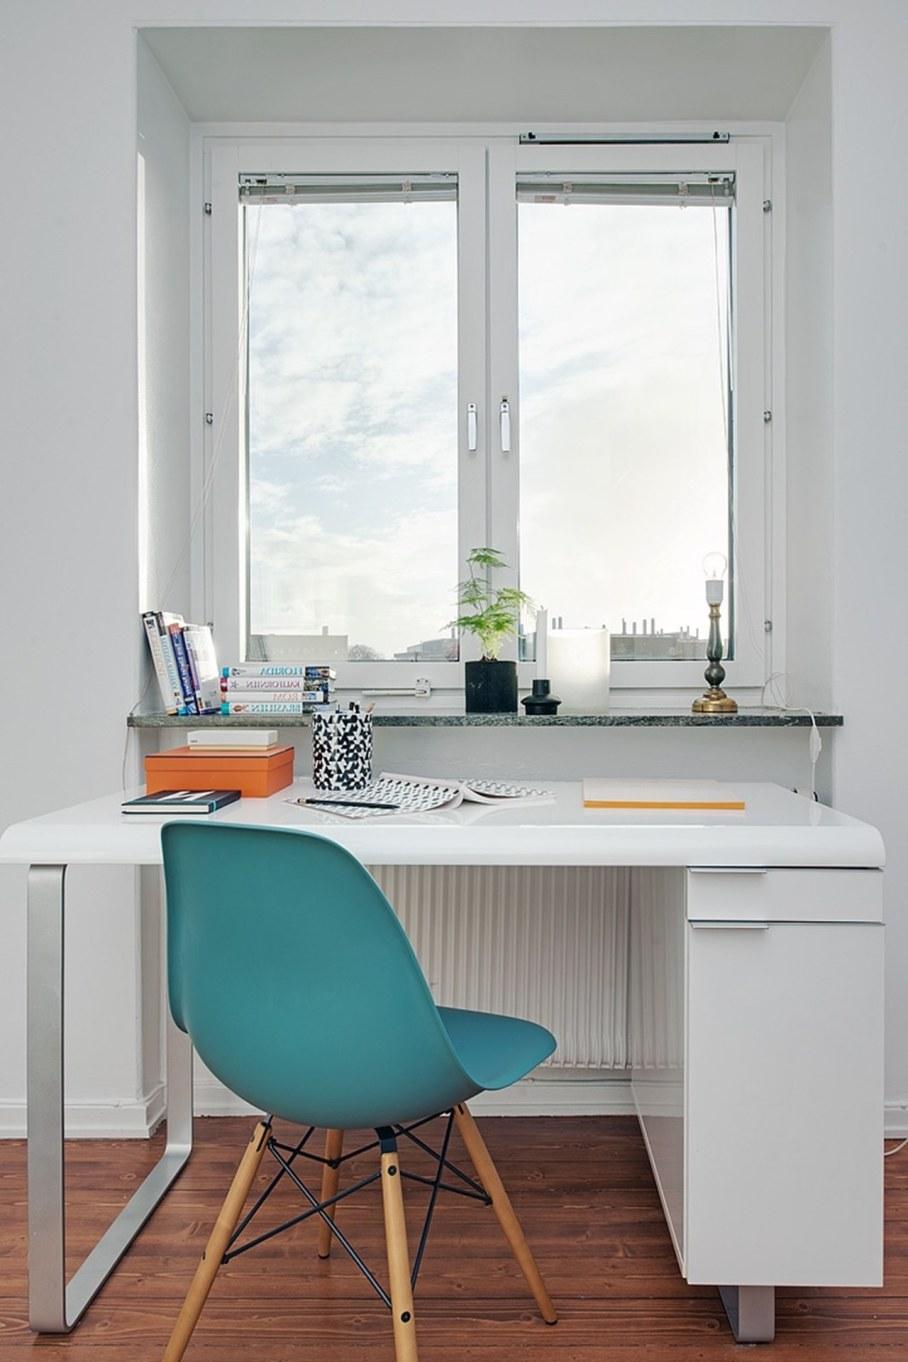 Bedroom design in Scandinavian style - windows must have minimal decor